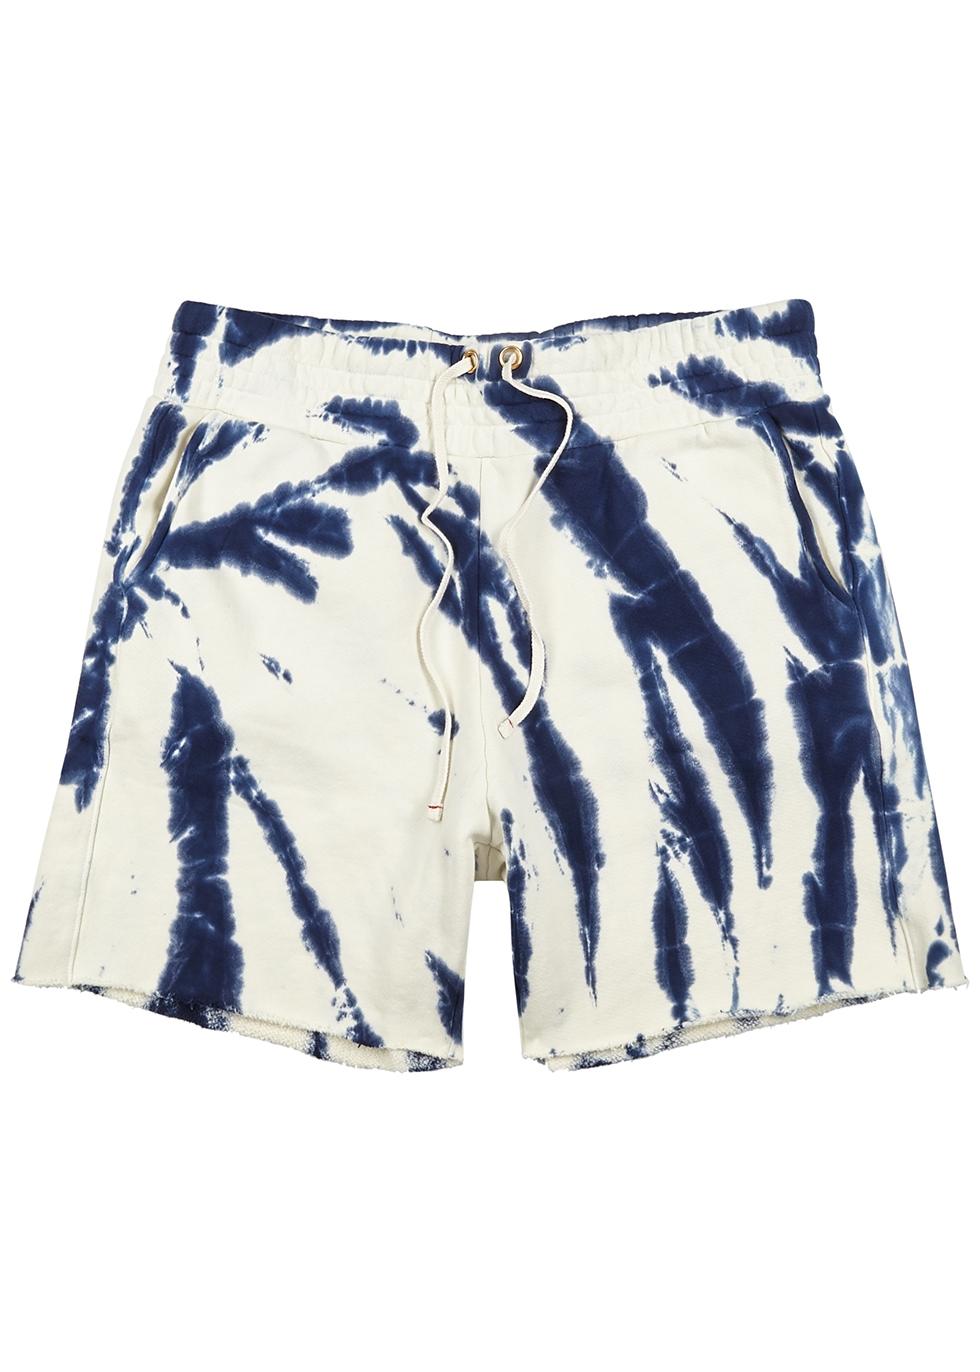 Yacht tie-dye cotton shorts